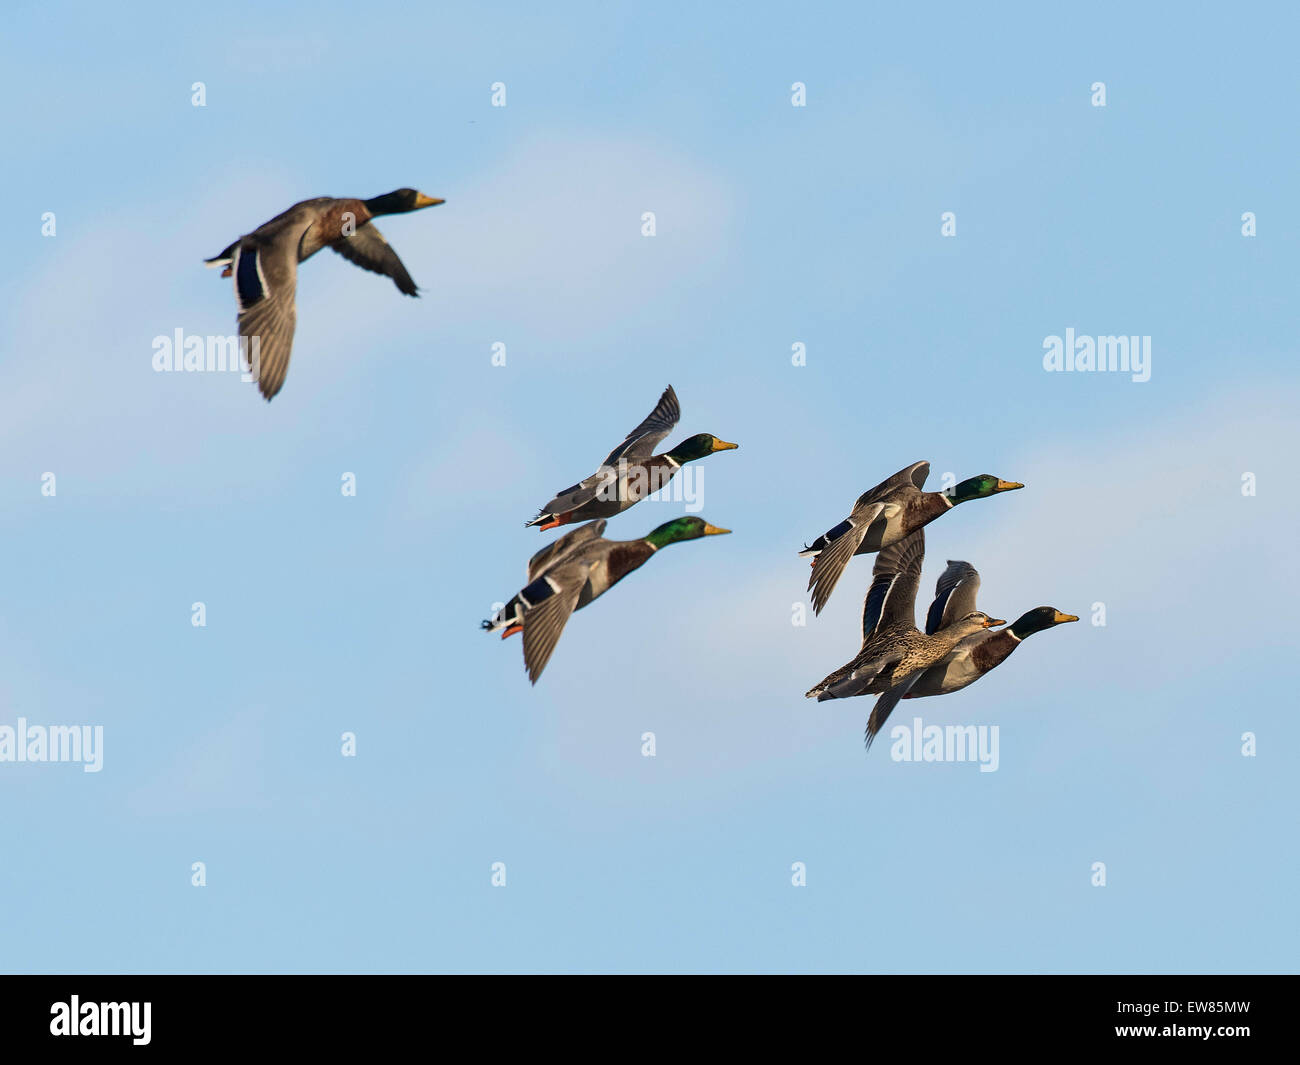 A flying flock of Mallard Ducks - Stock Image